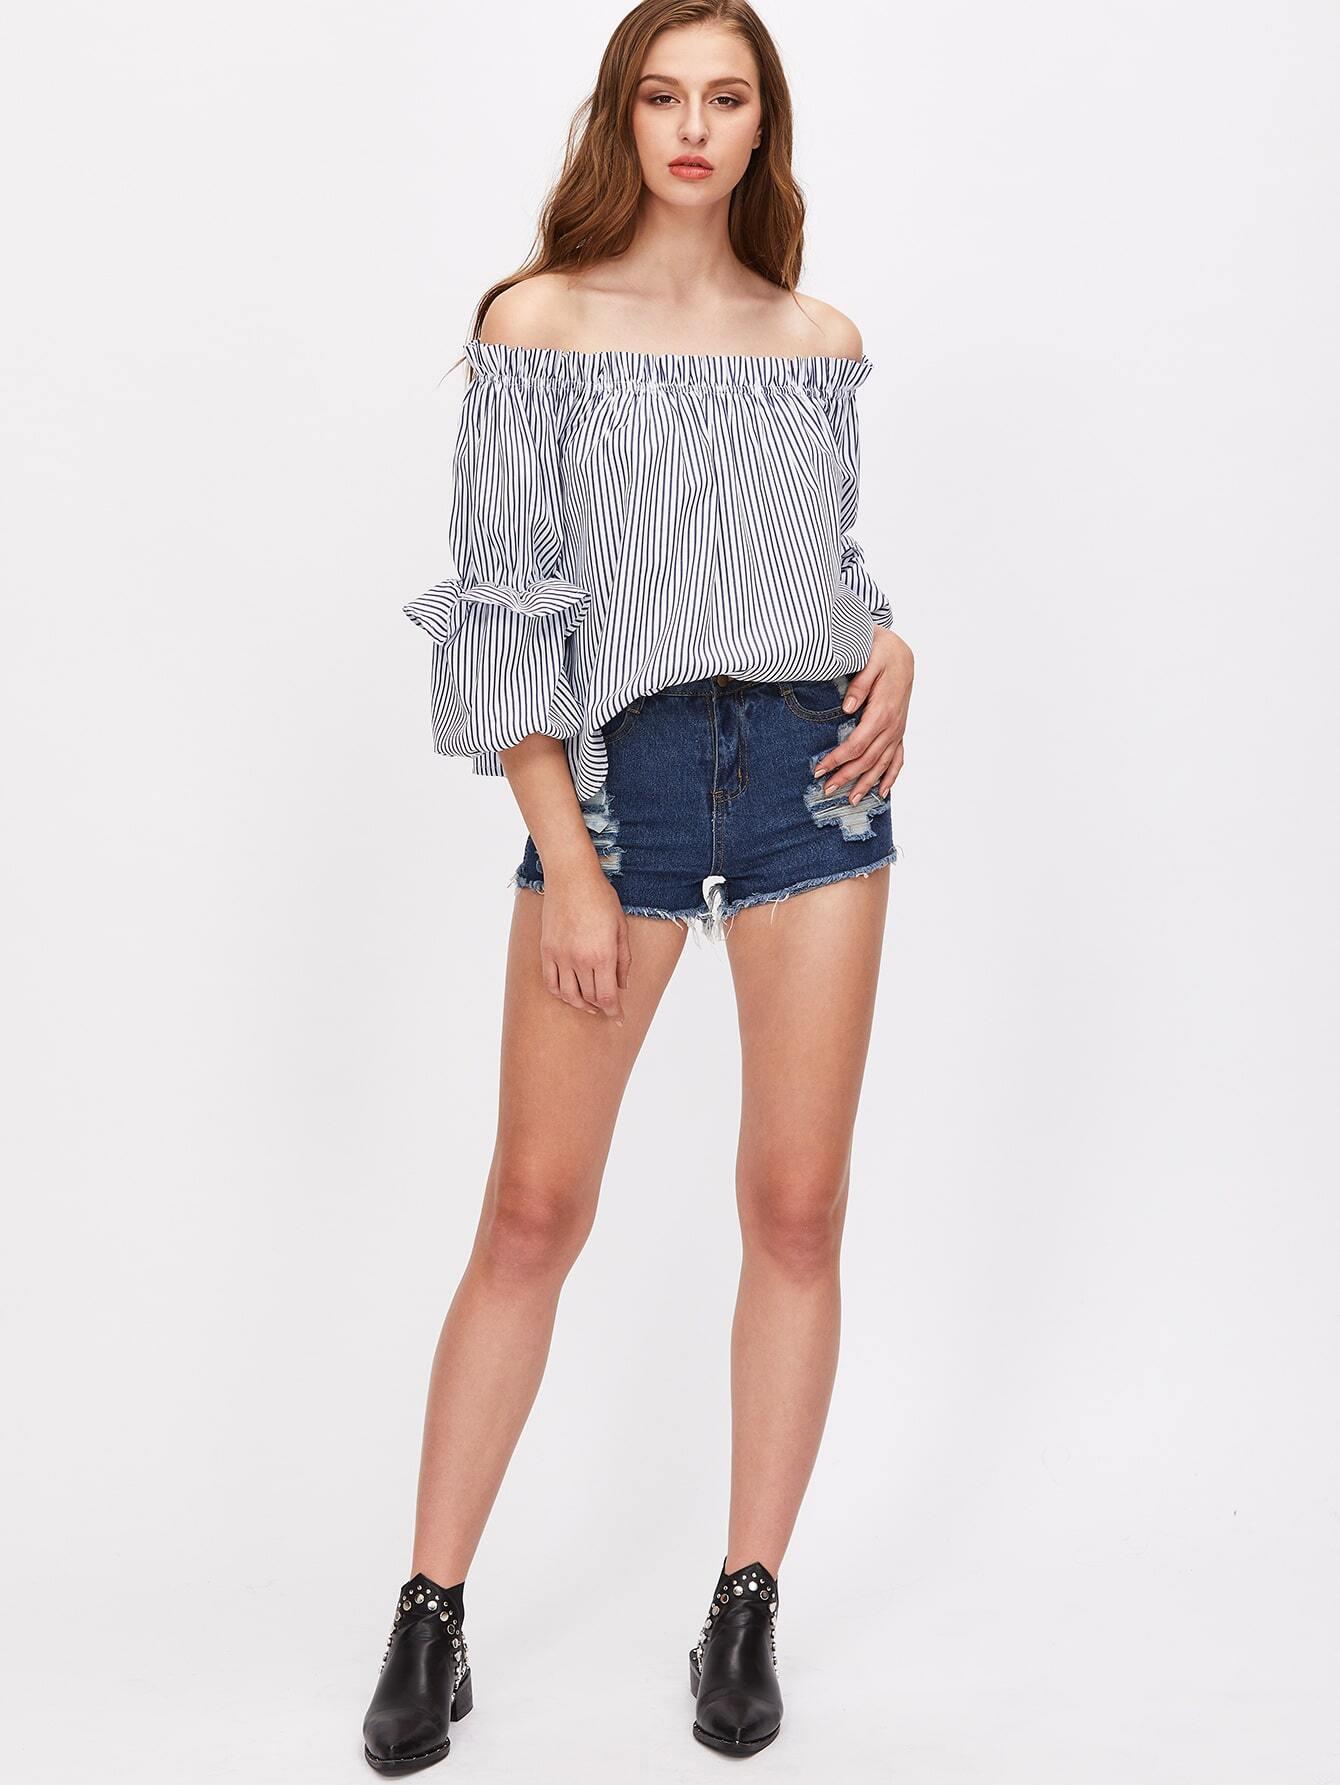 blouse161223701_2